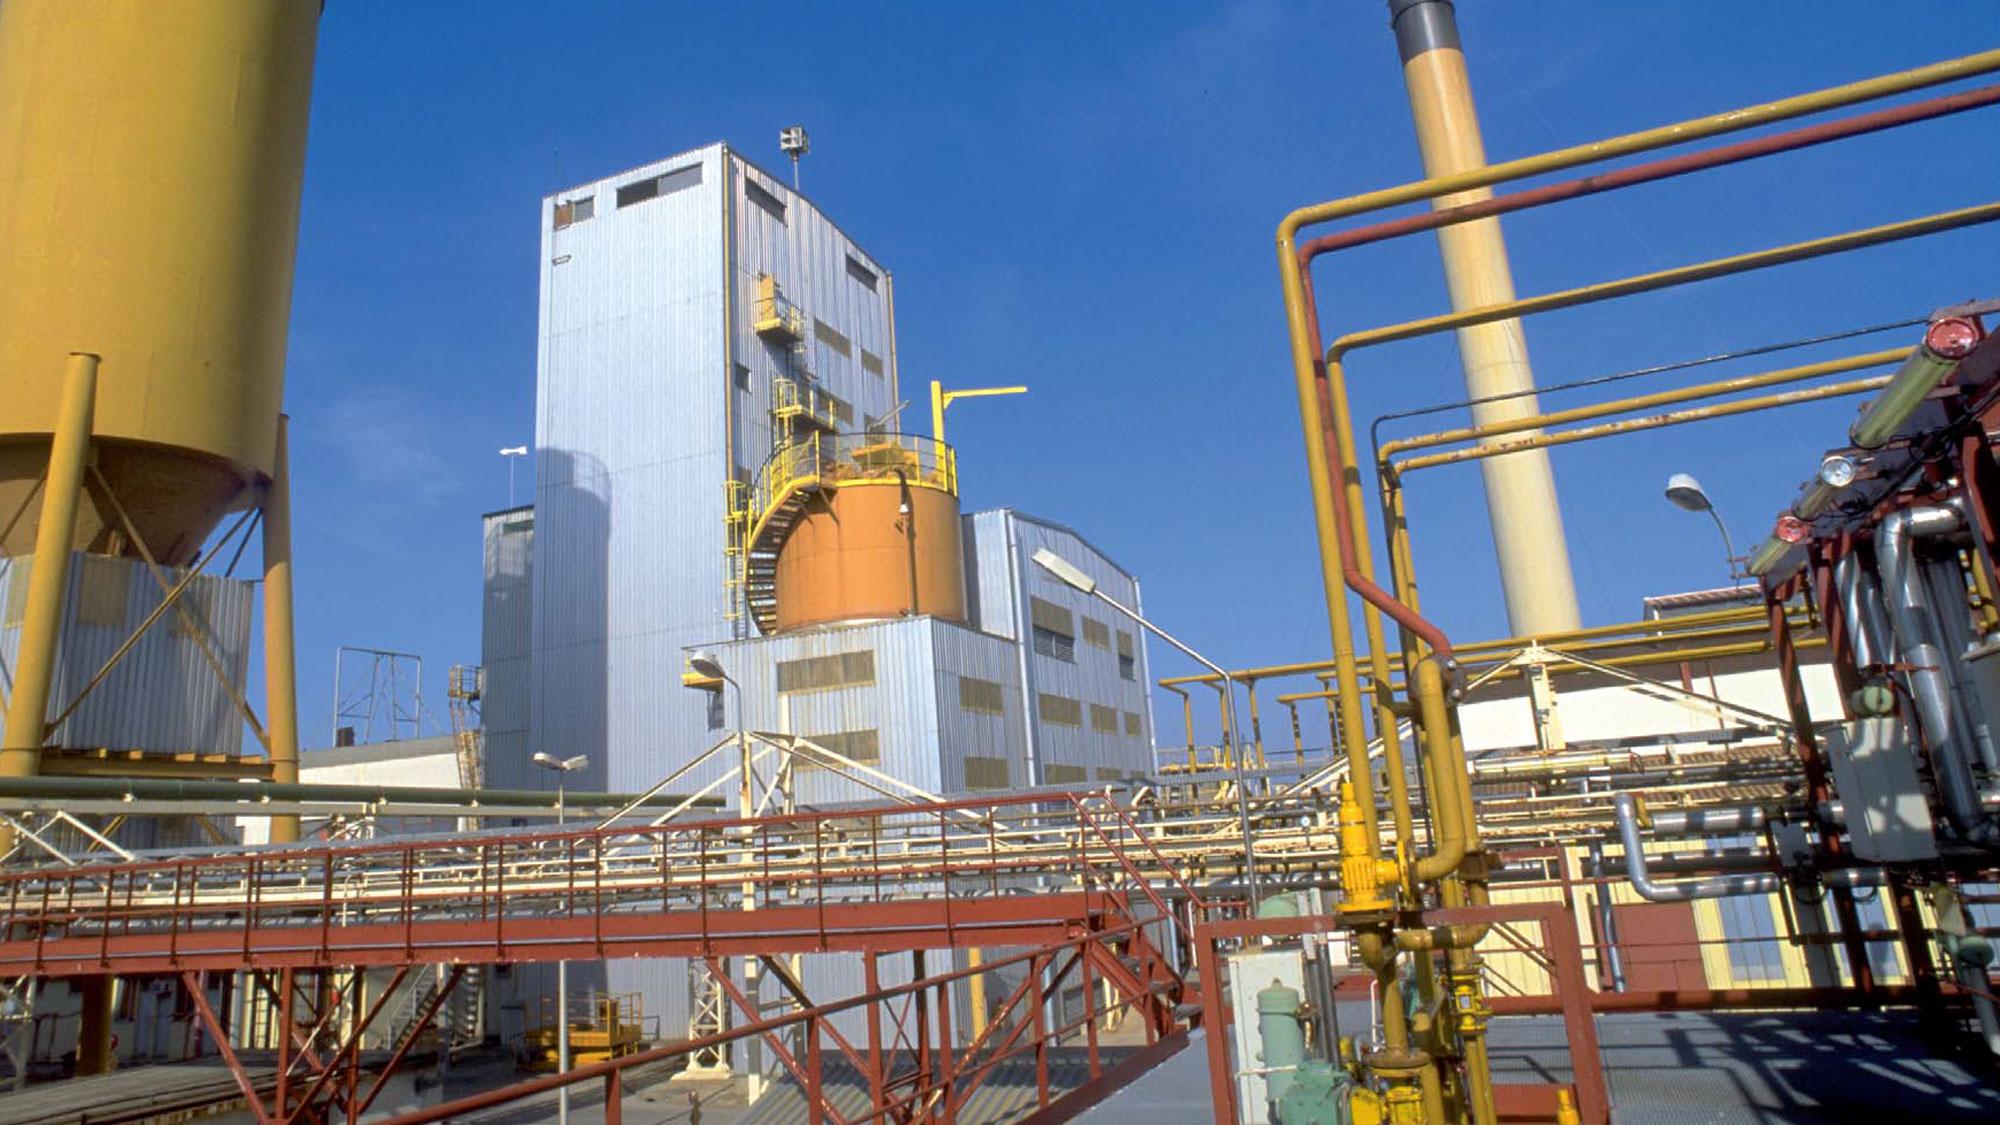 Areva Comurhex stormwater treatment